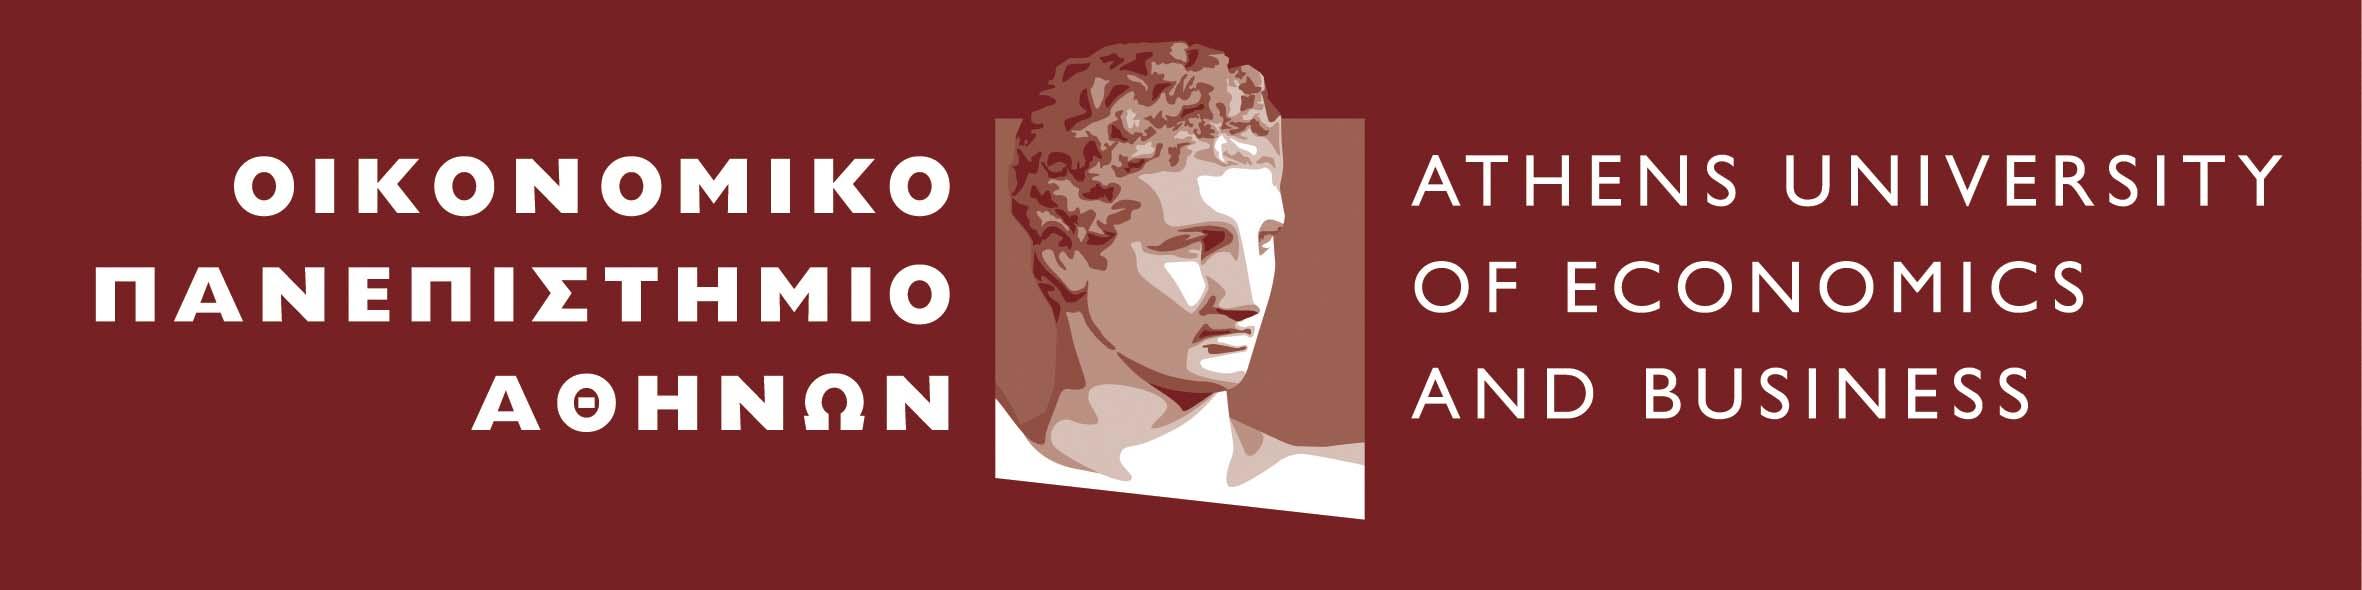 https://www.aueb.gr/press/logos/1_AUEB-pantone-HR.jpg